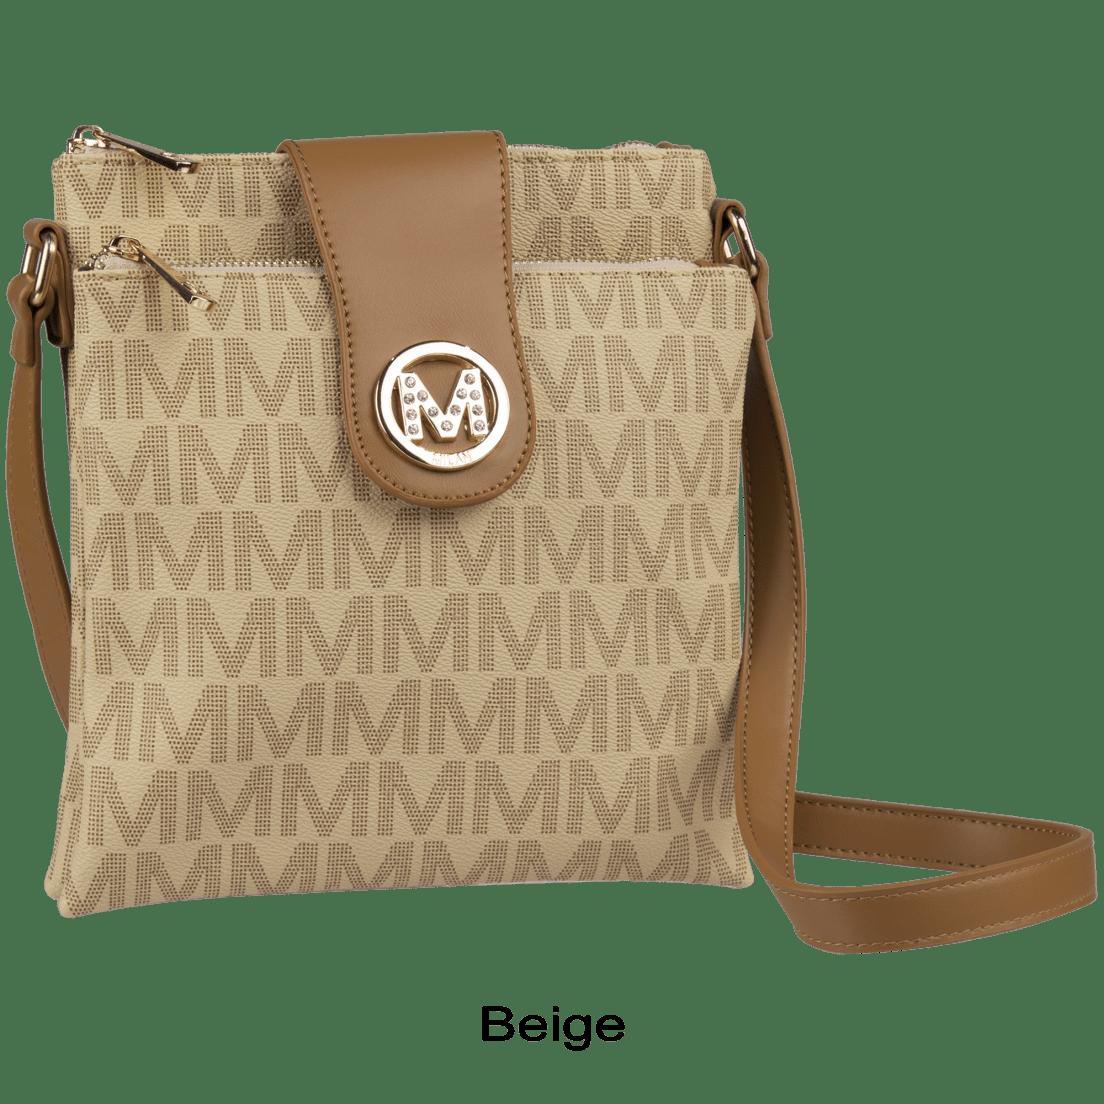 3052237310a3 Milan Imports Crossbody Bag